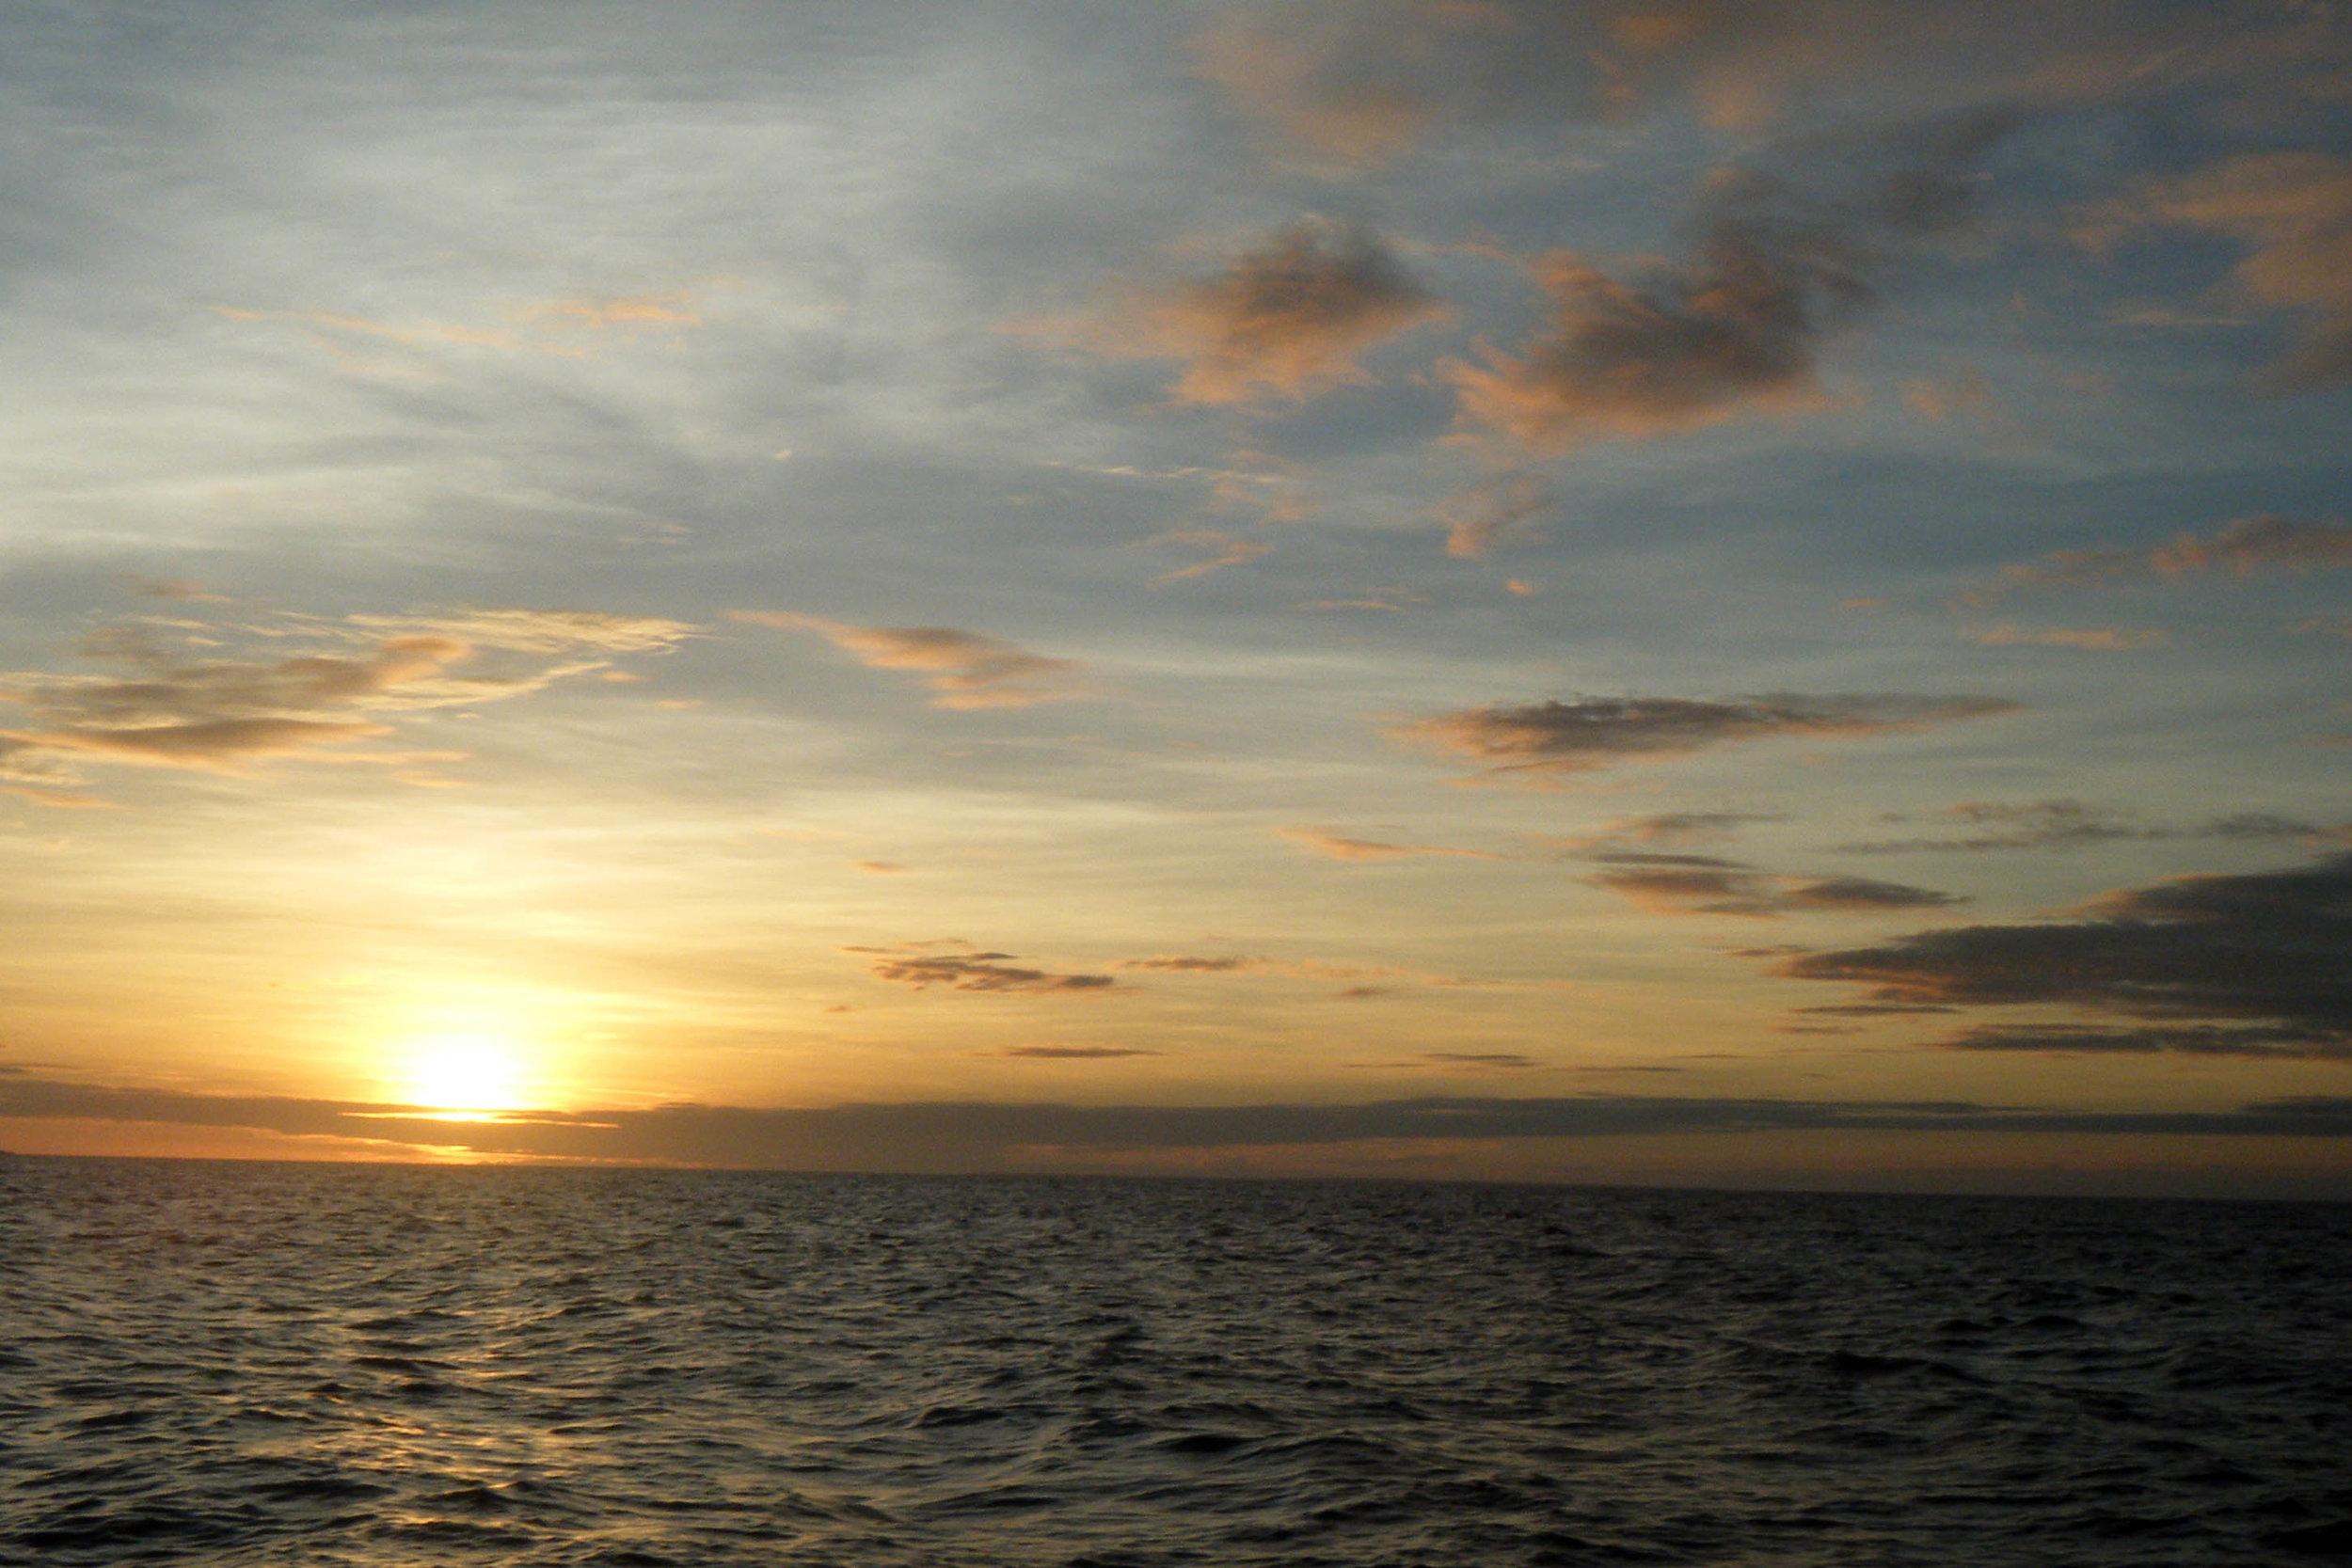 sunset over Cebu.jpg